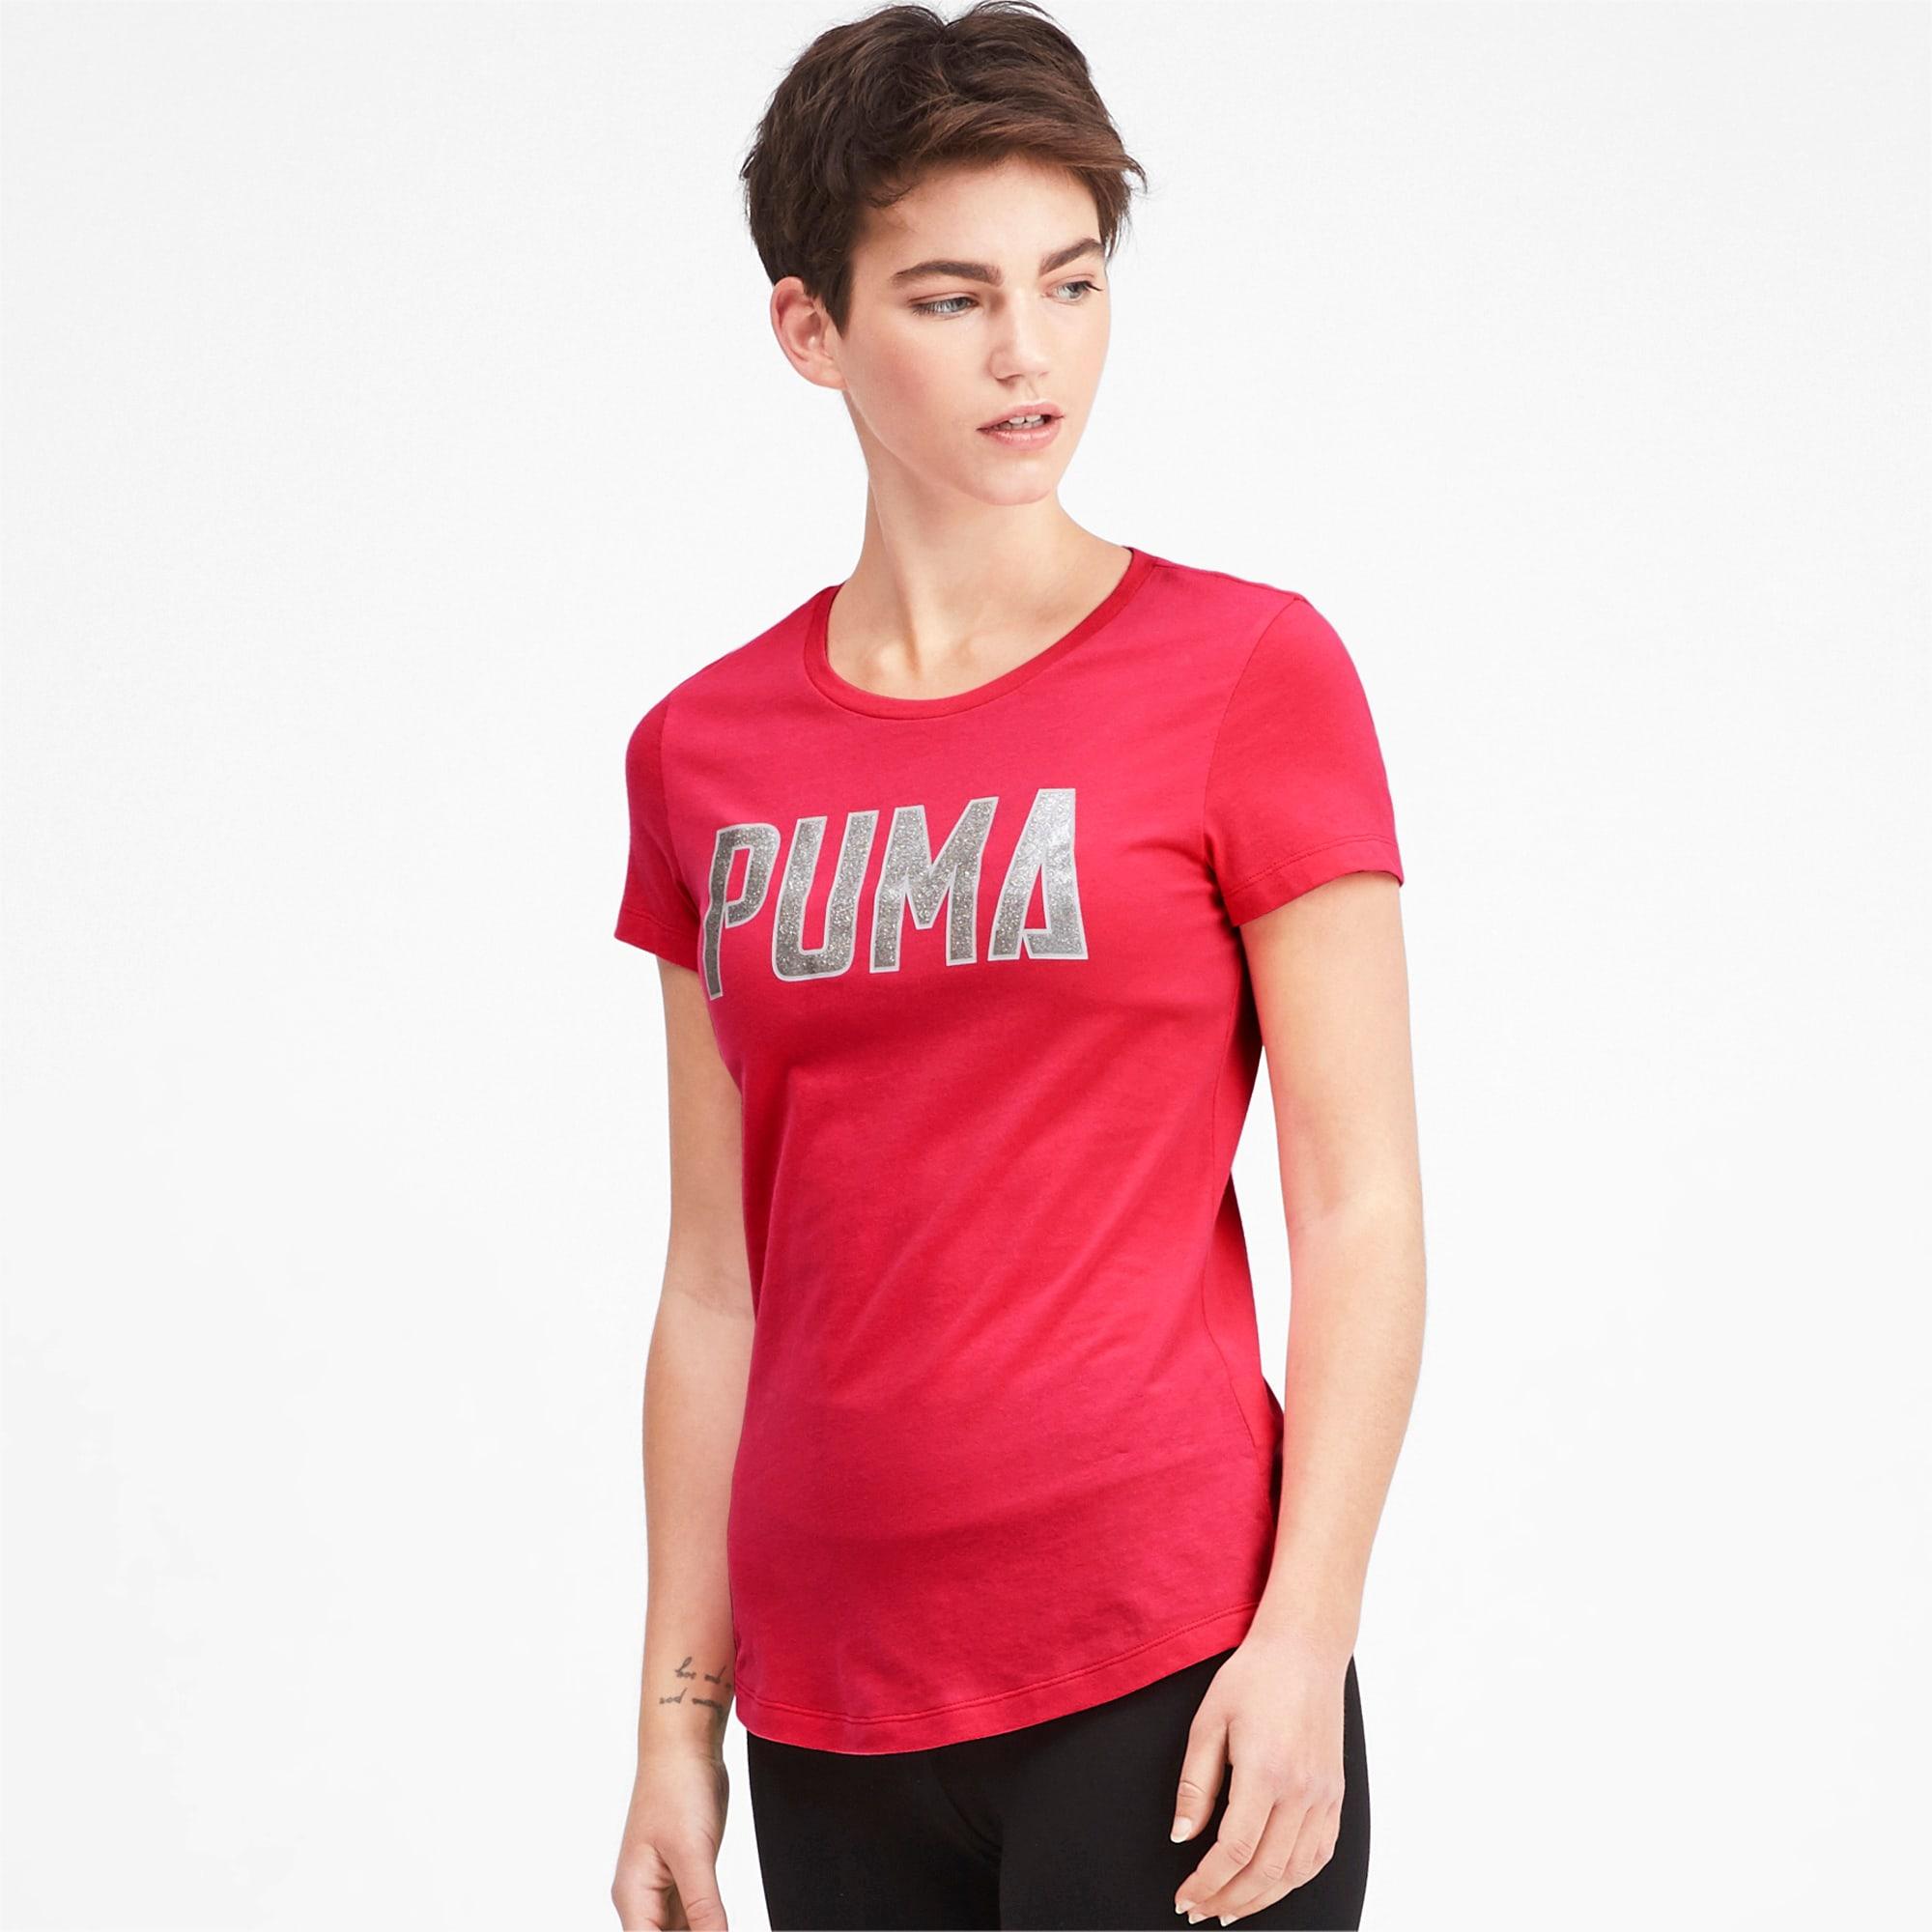 puma athletics